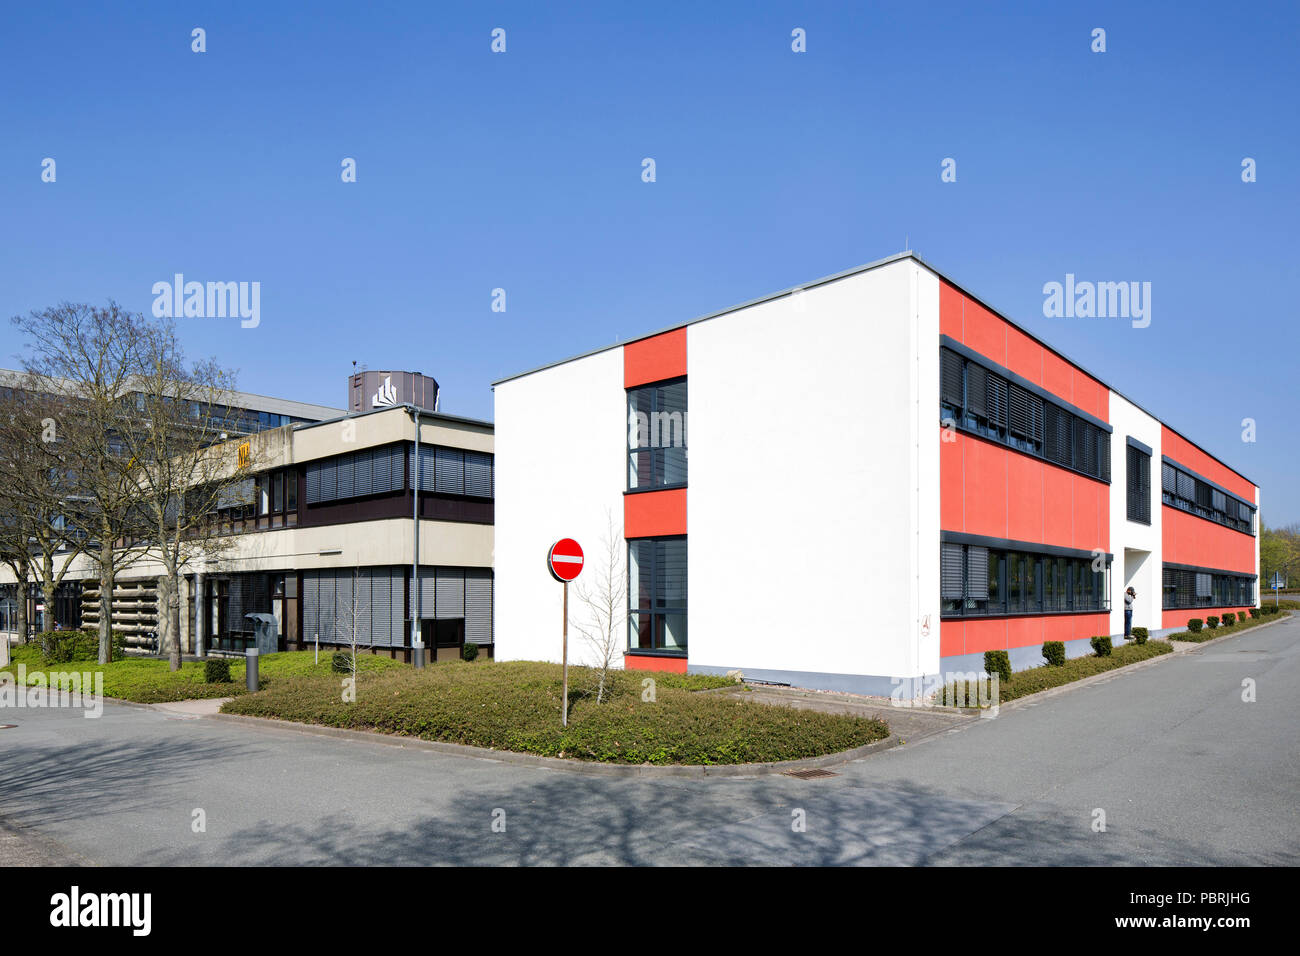 University of Paderborn, main campus, Halle natural sciences, Paderborn, East-Westphalia, North Rhine-Westphalia, Germany - Stock Image